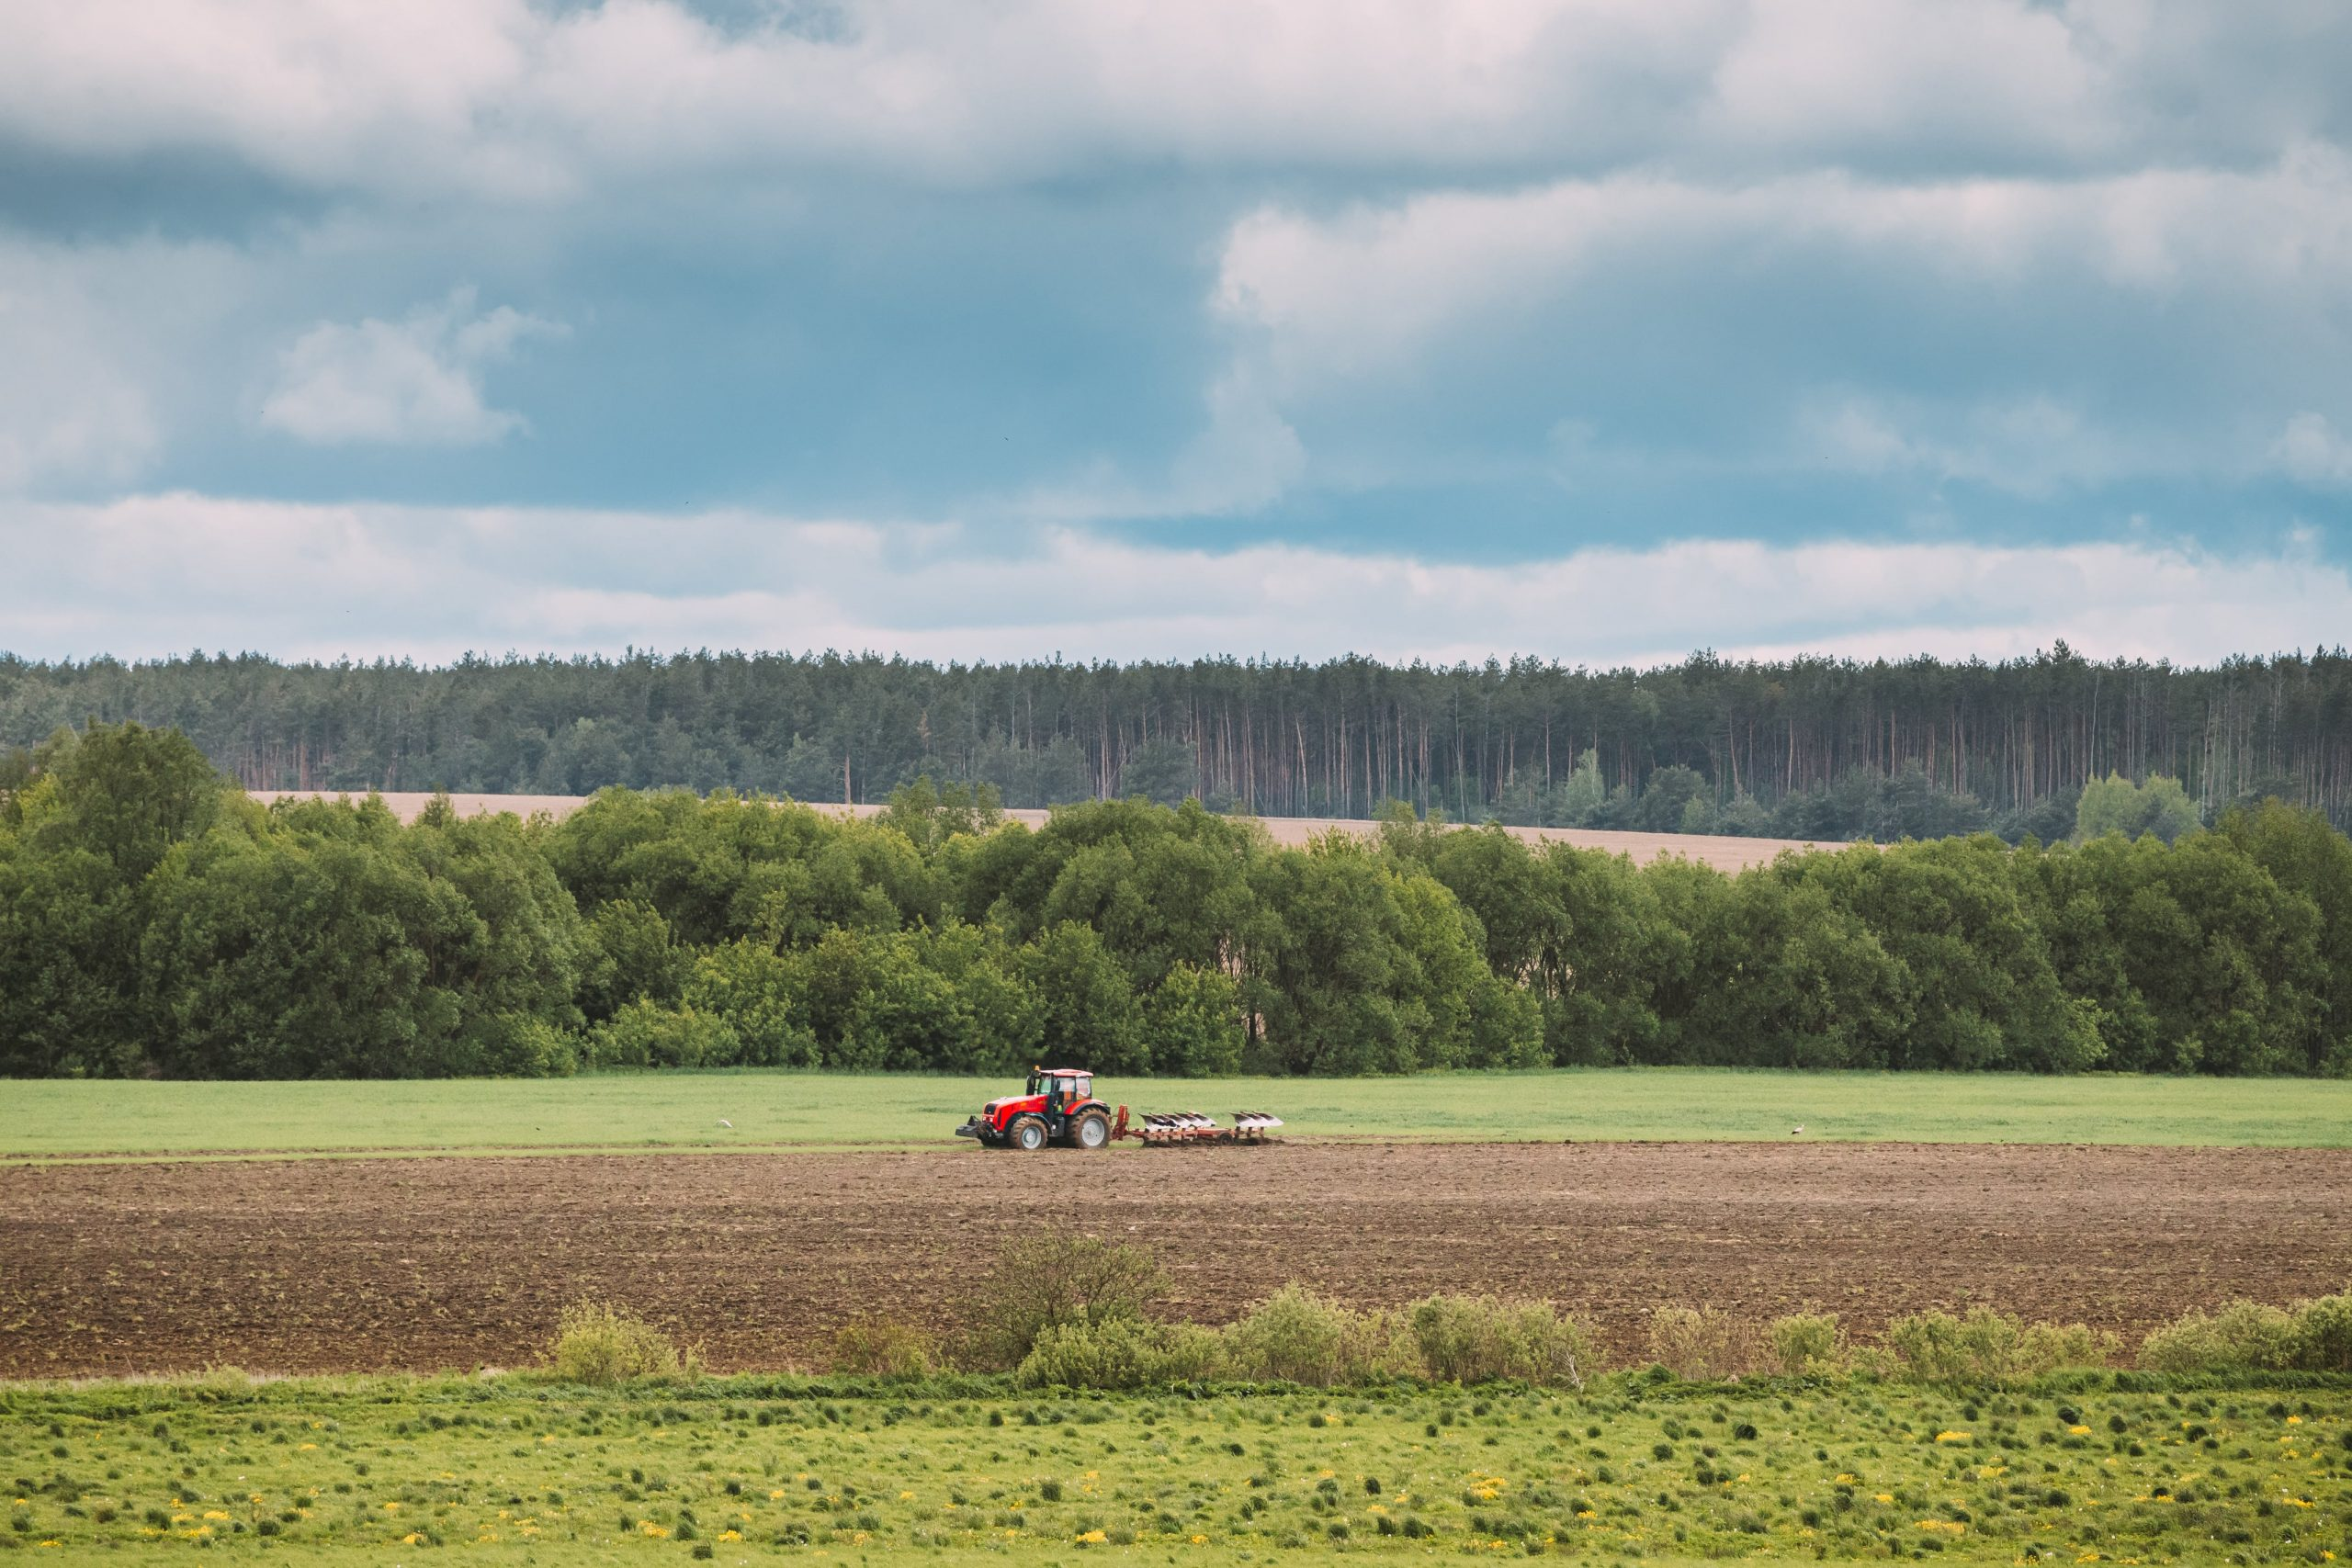 tractor-plowing-field-in-spring-season-beginning-o-LL29PCD